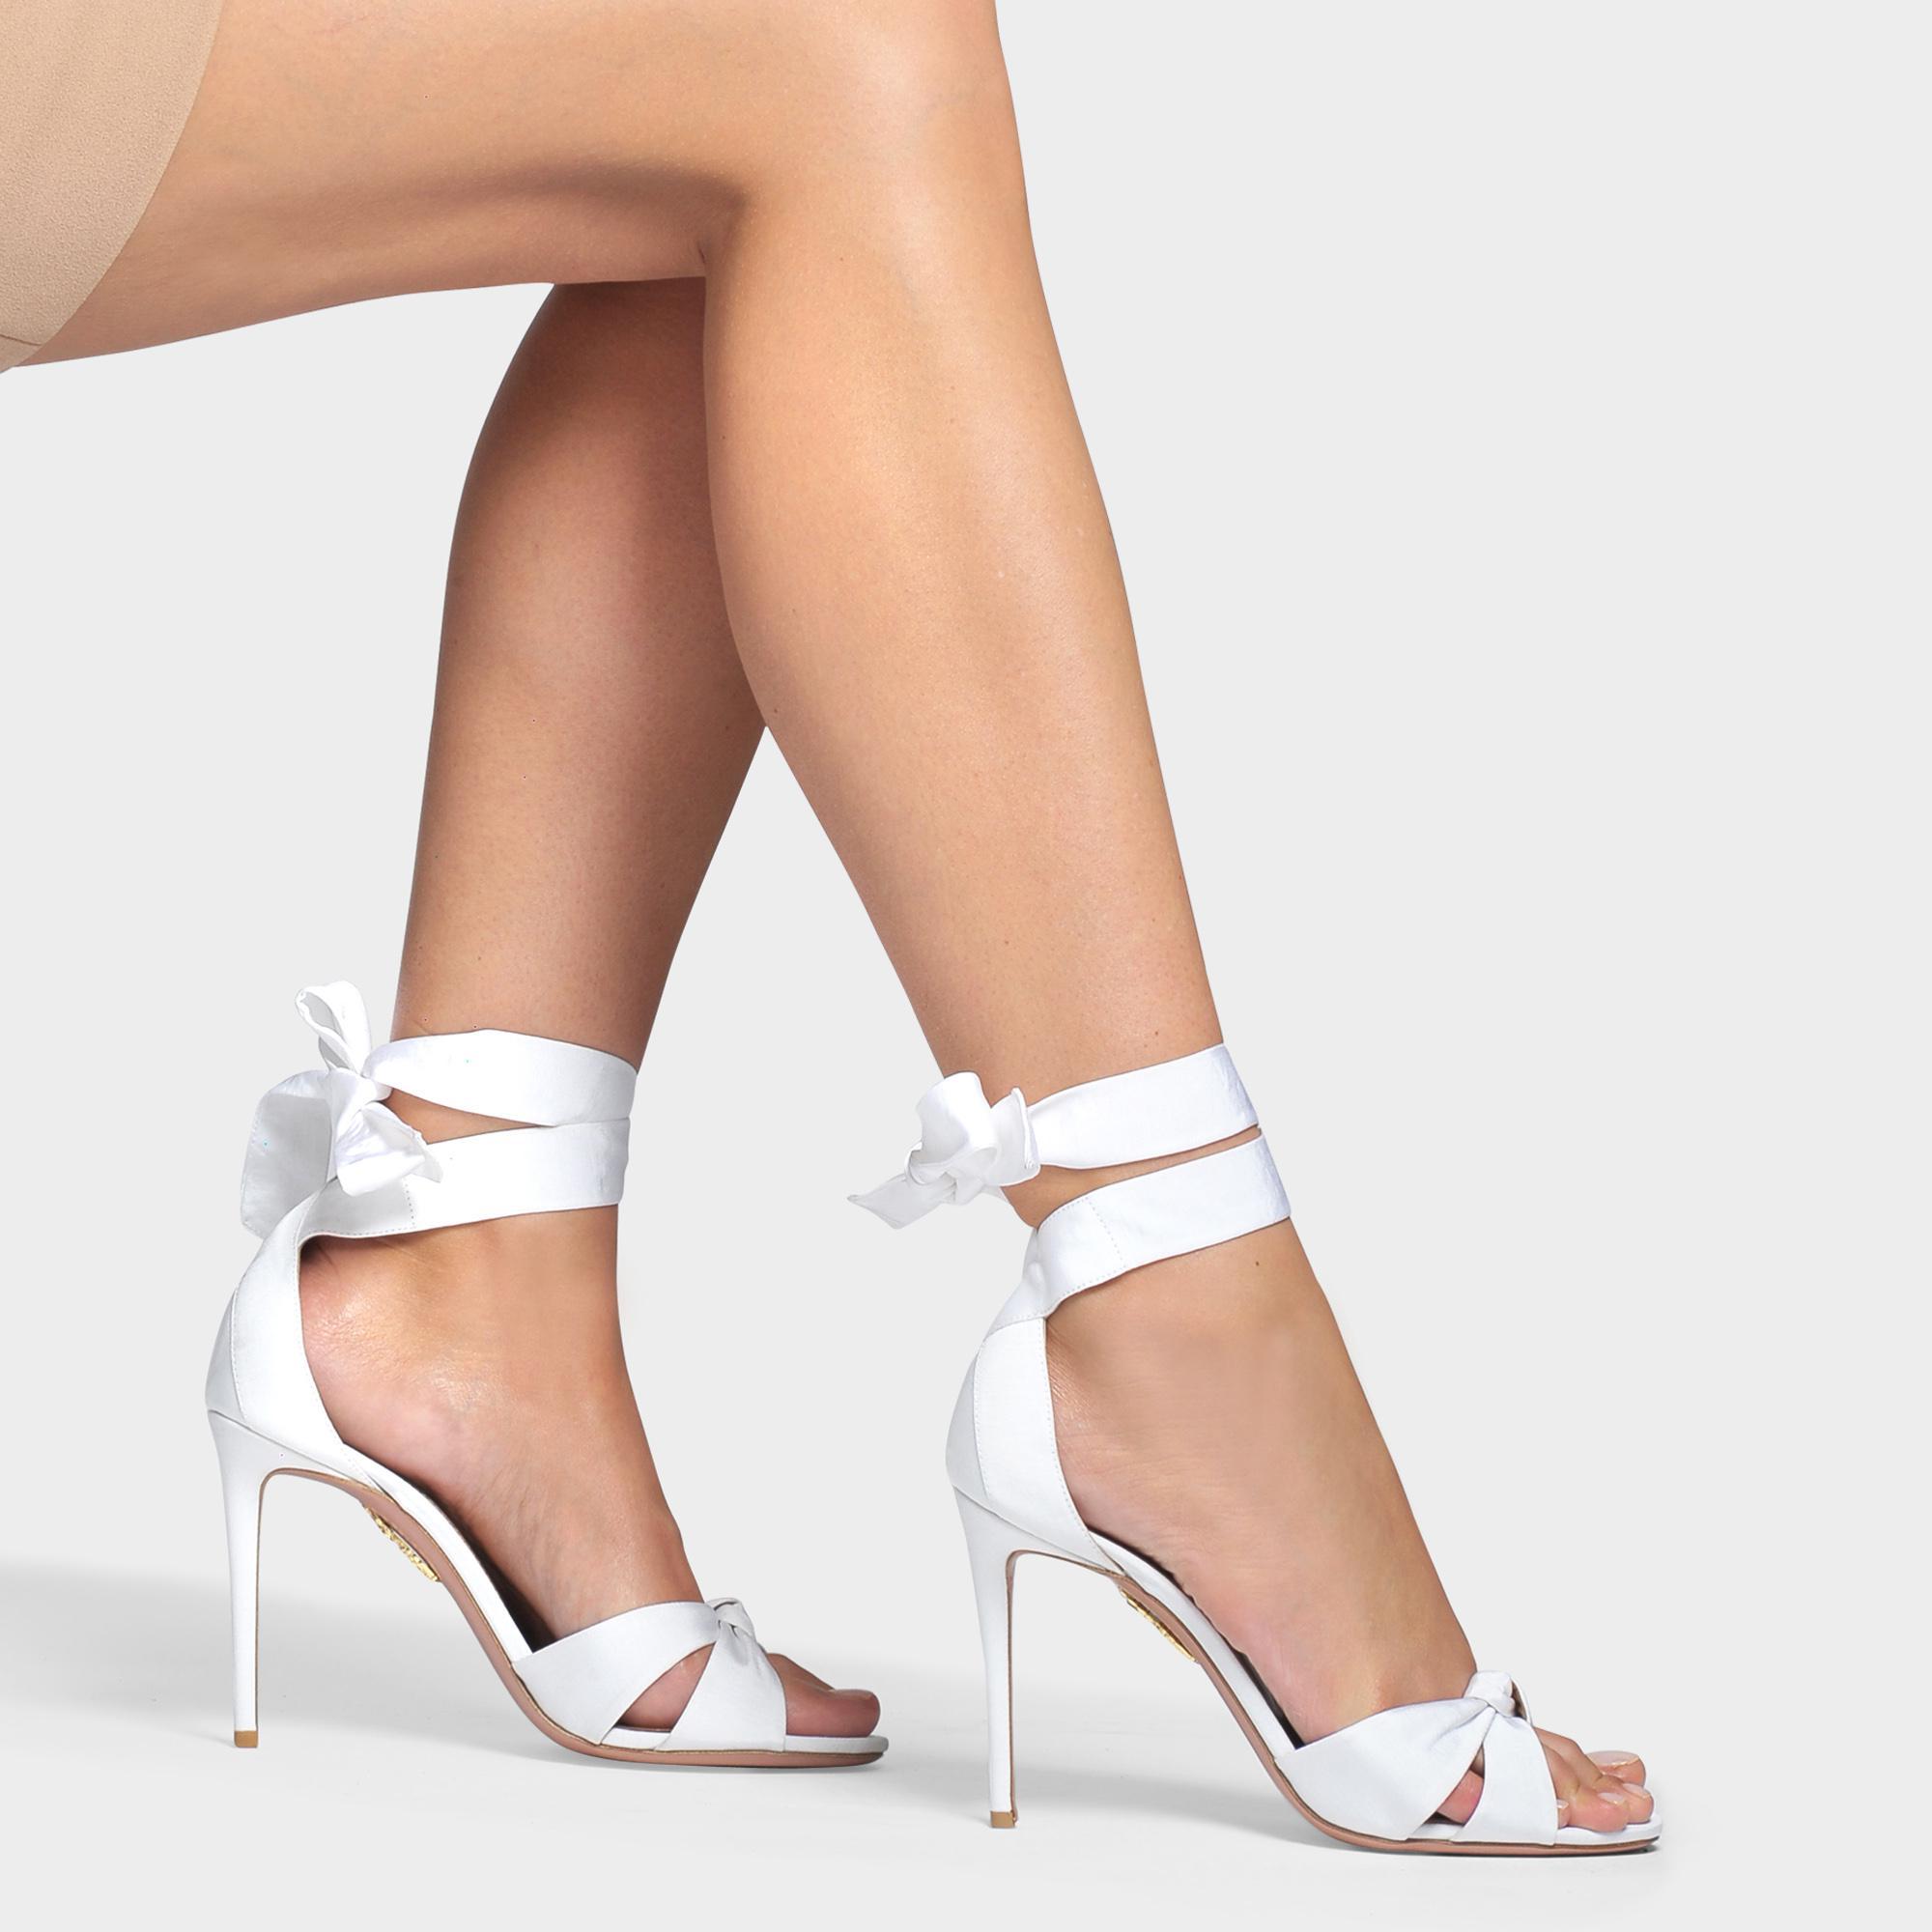 c858f1ea8232 Lyst - Aquazzura All Tied Up 105 Sandals In White Gros Grain in White